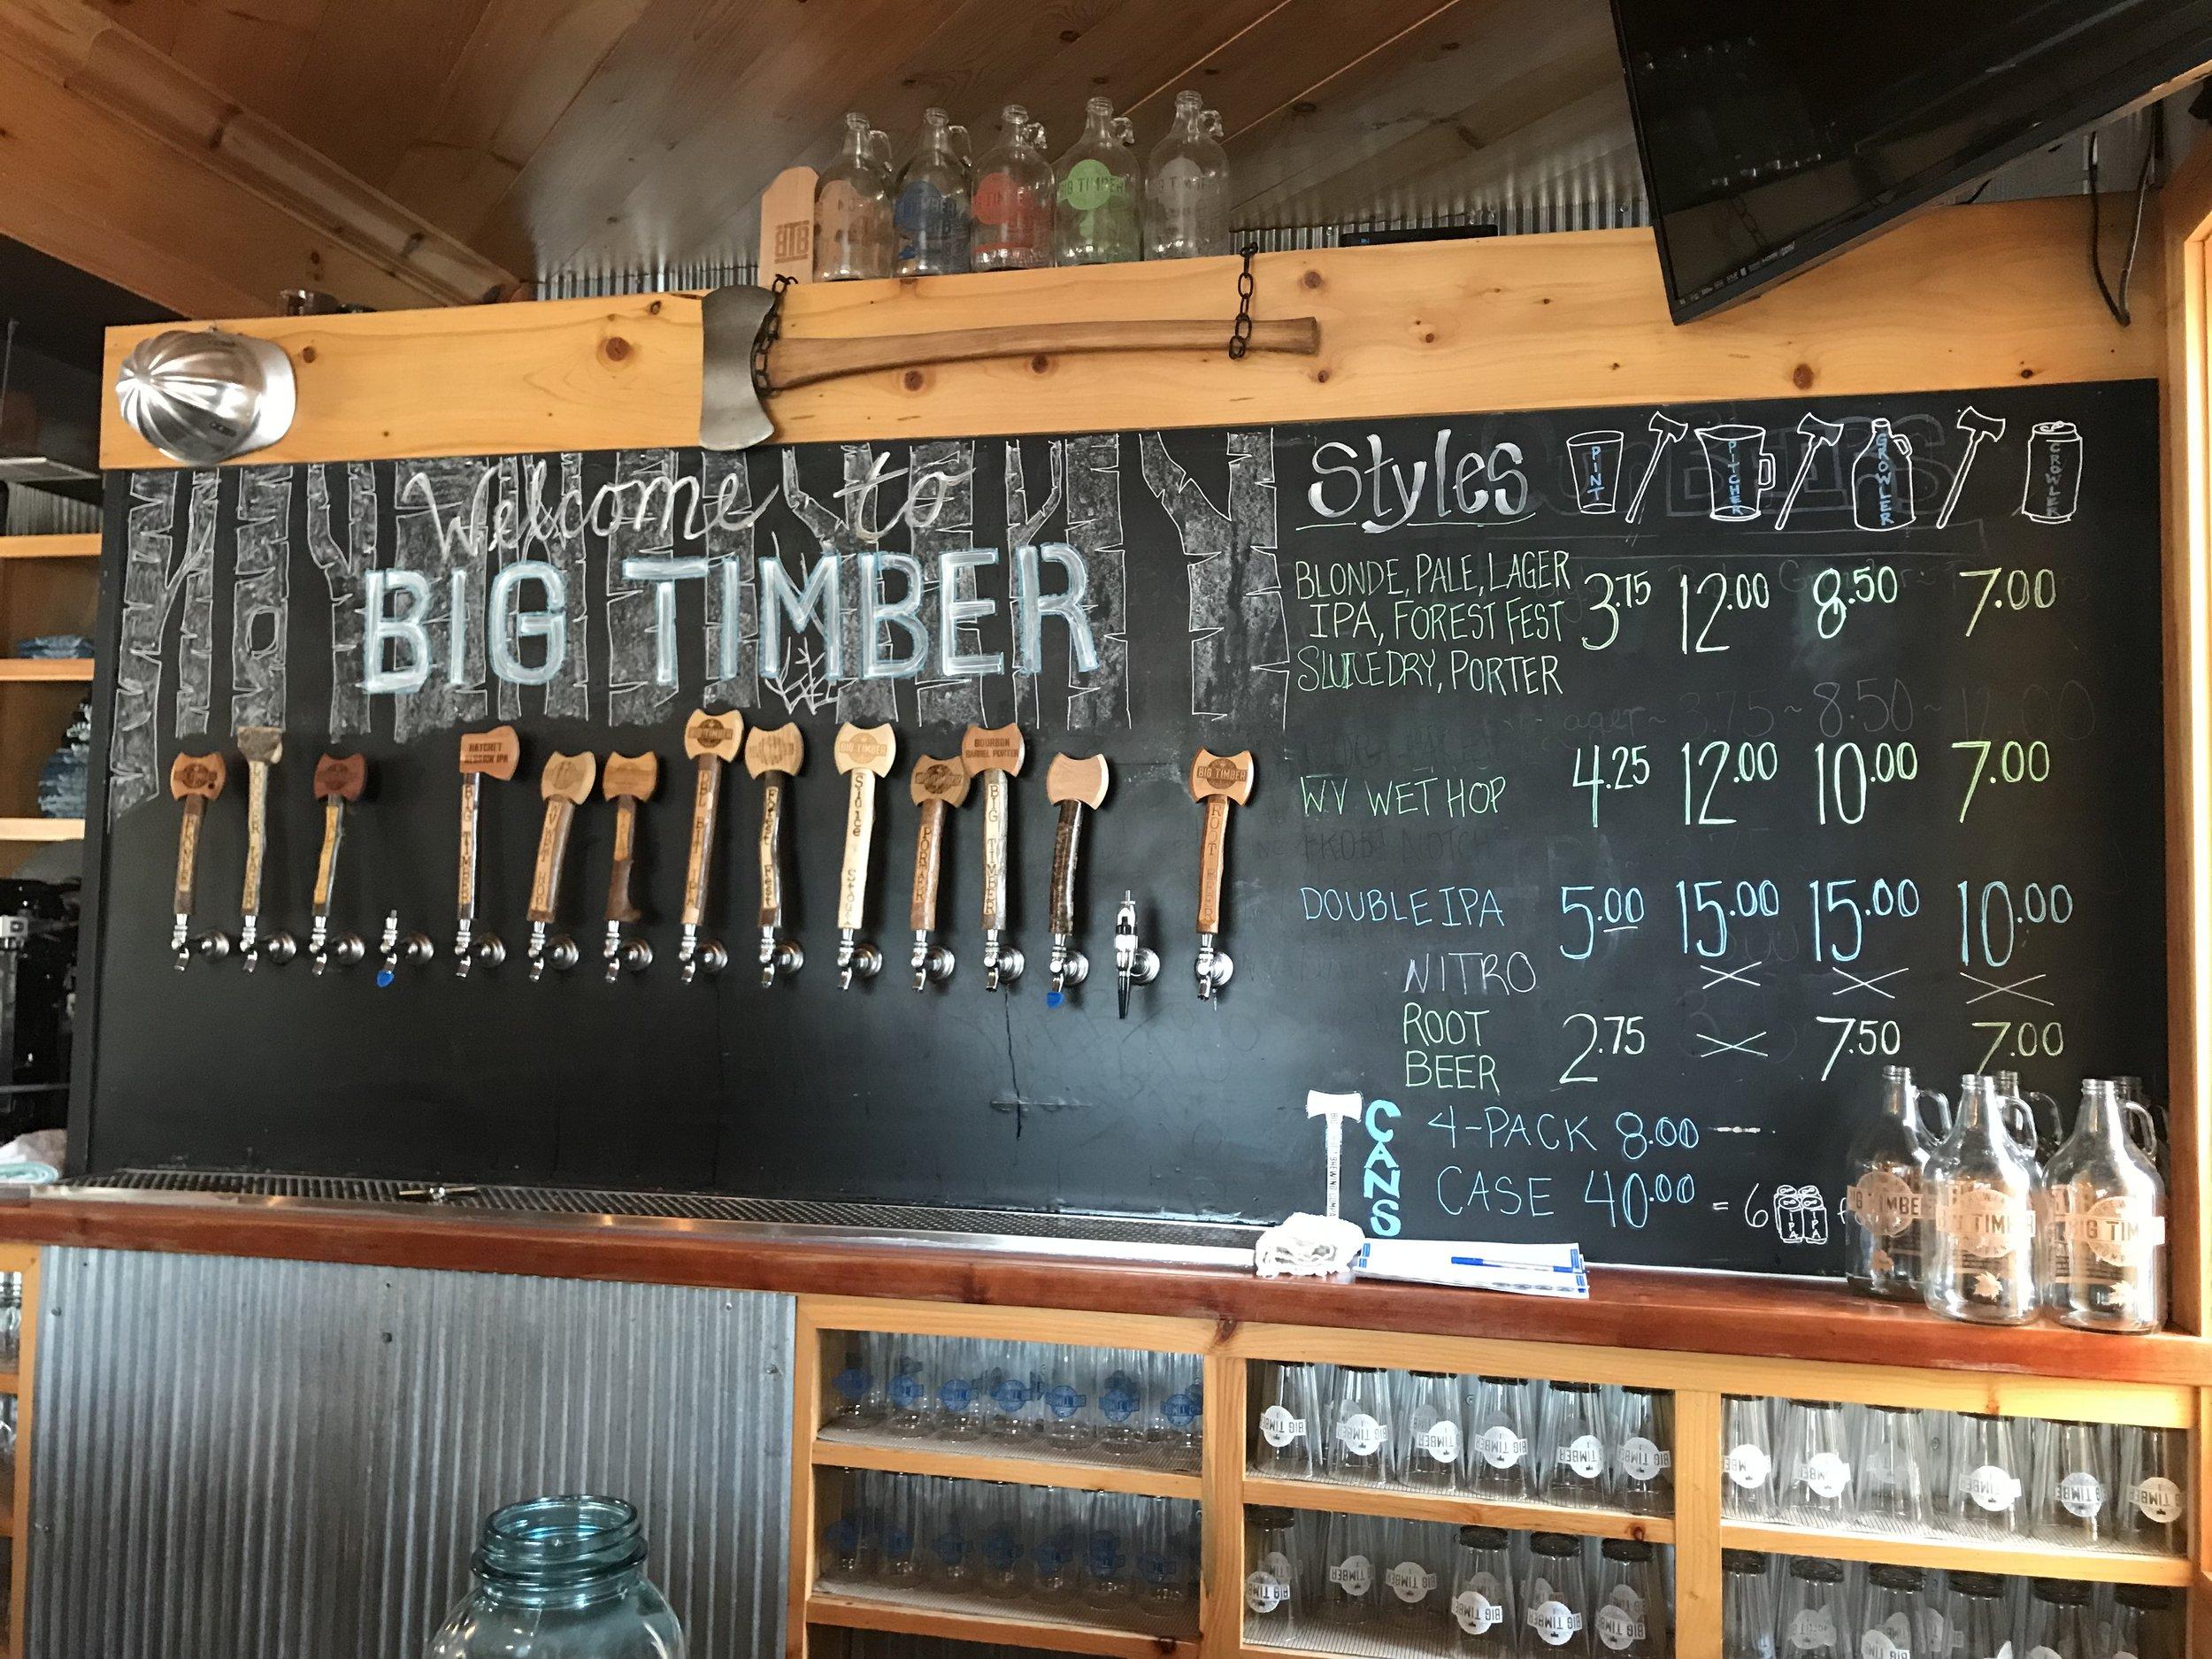 Big Timber Brewing Company